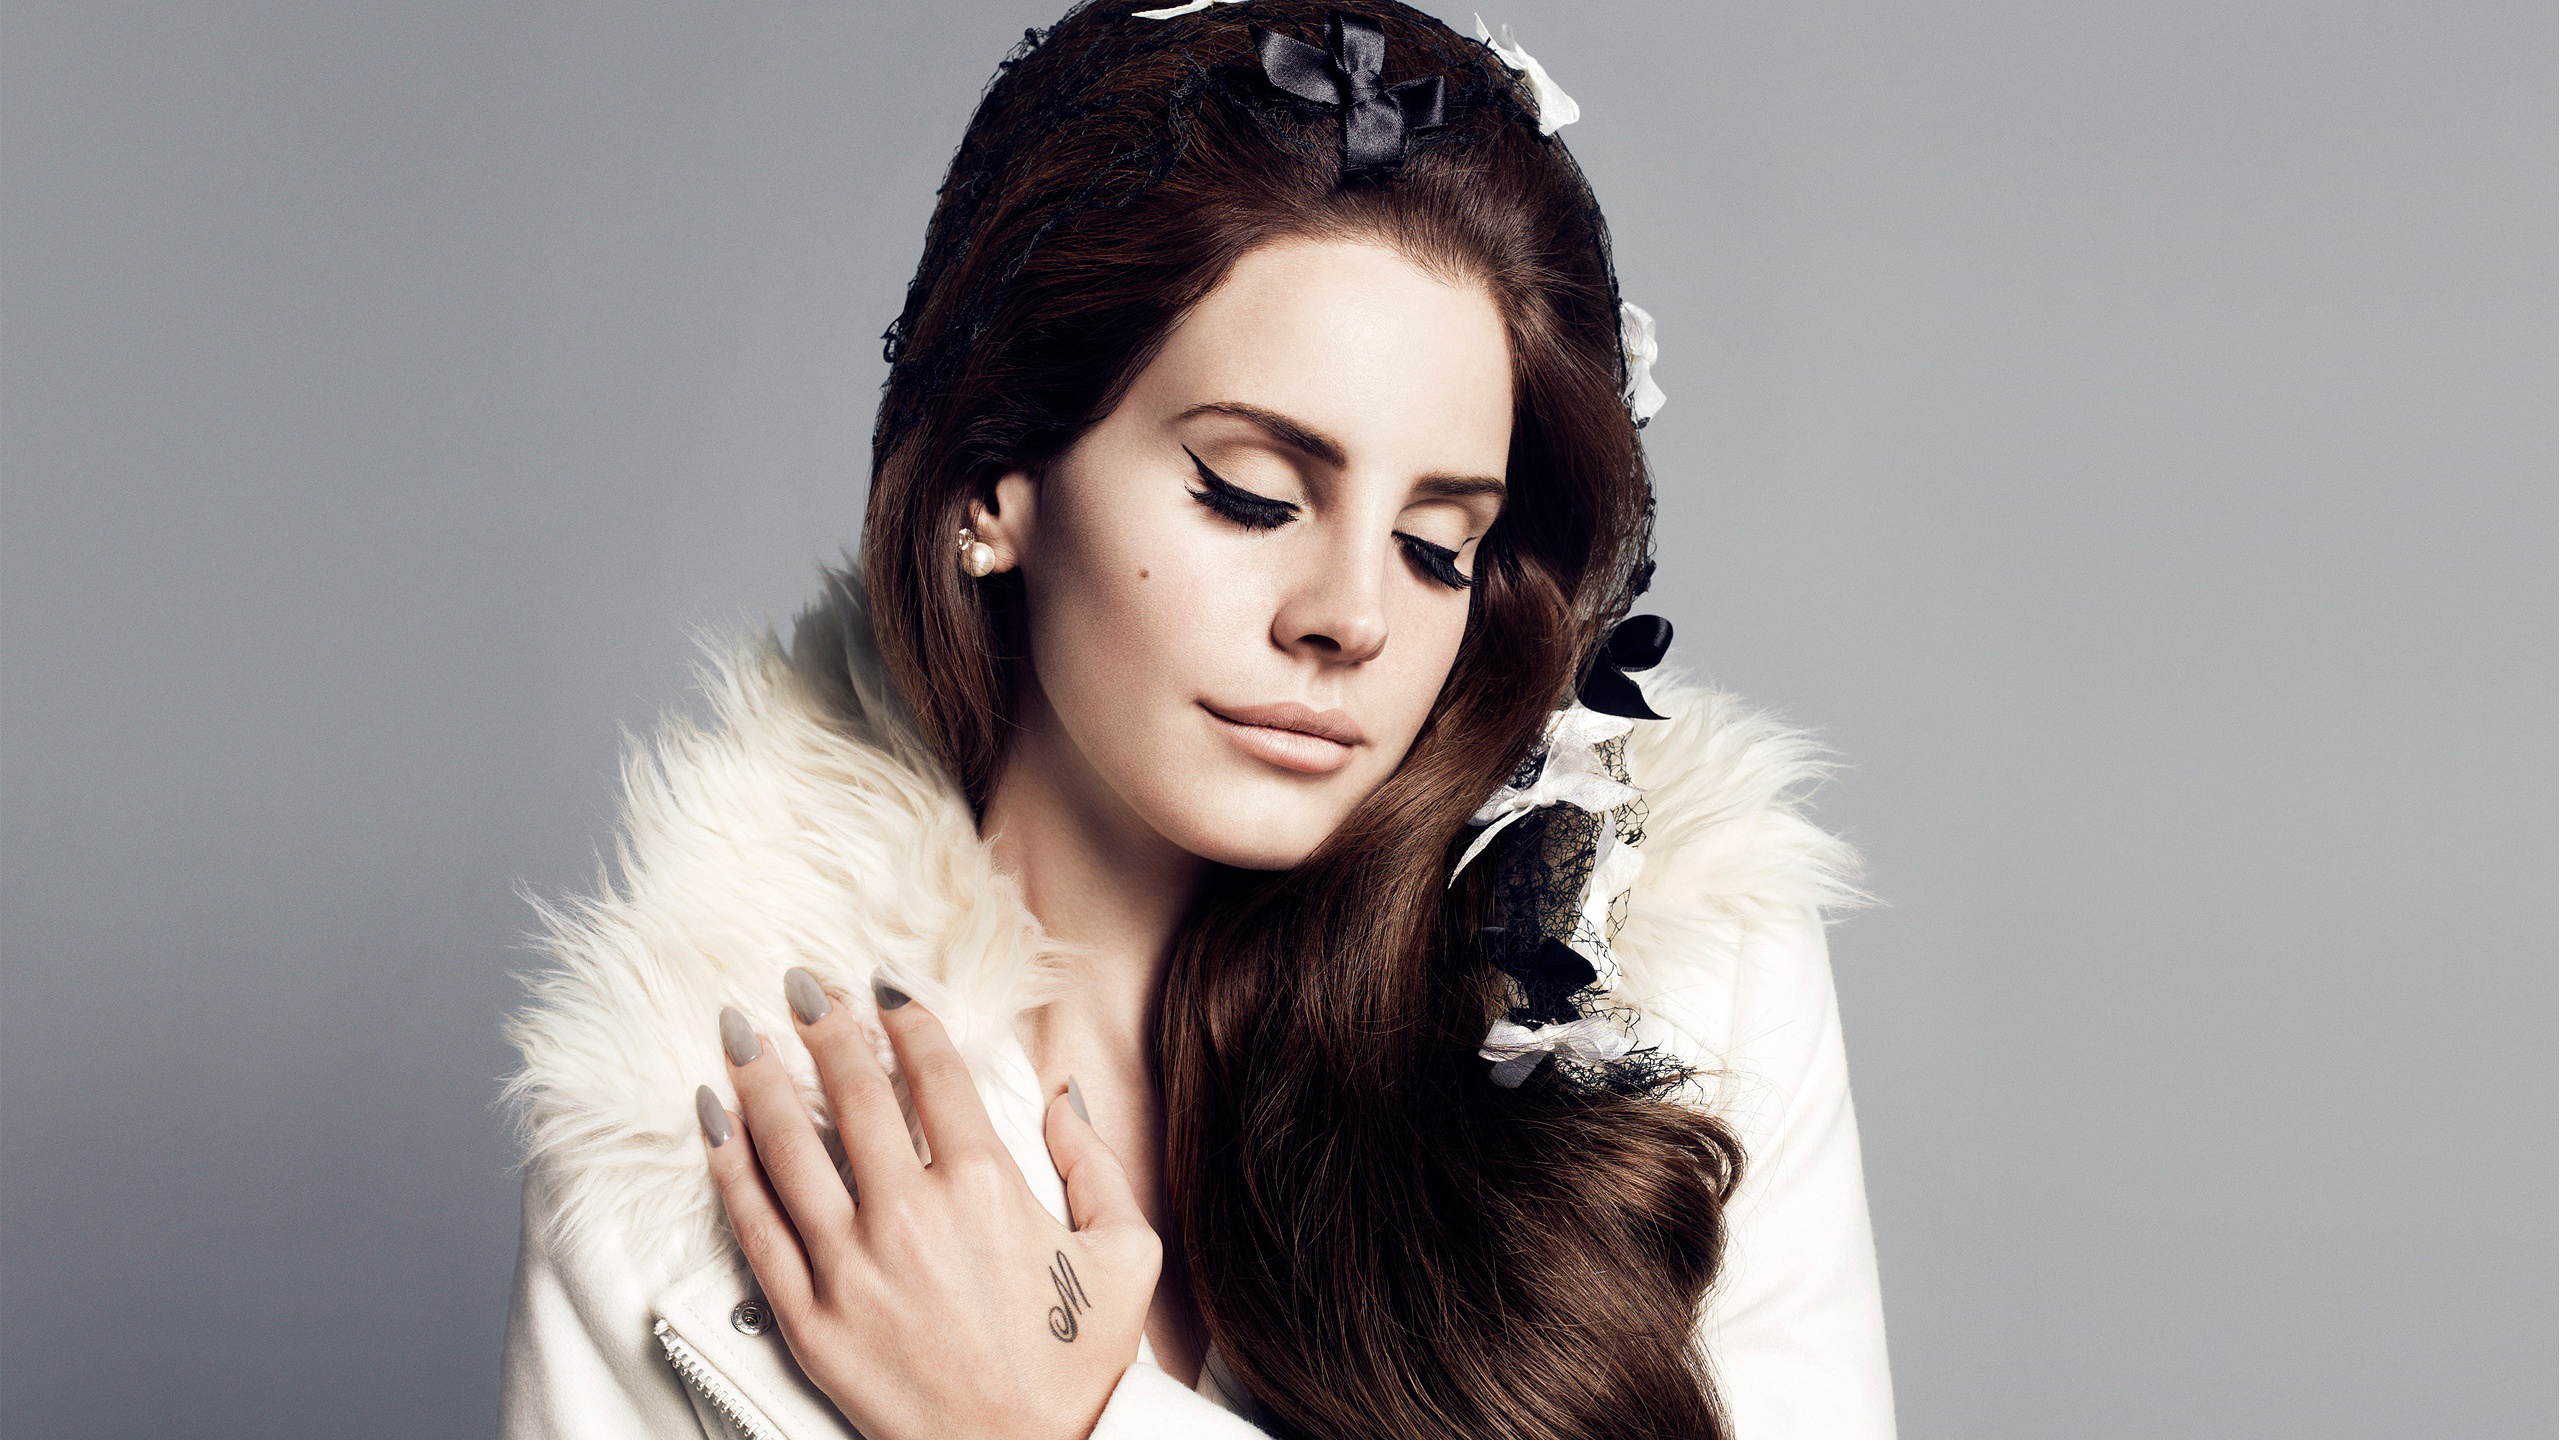 2560x1440 Lana Del Rey Portrait Wallpapers 1440p Resolution